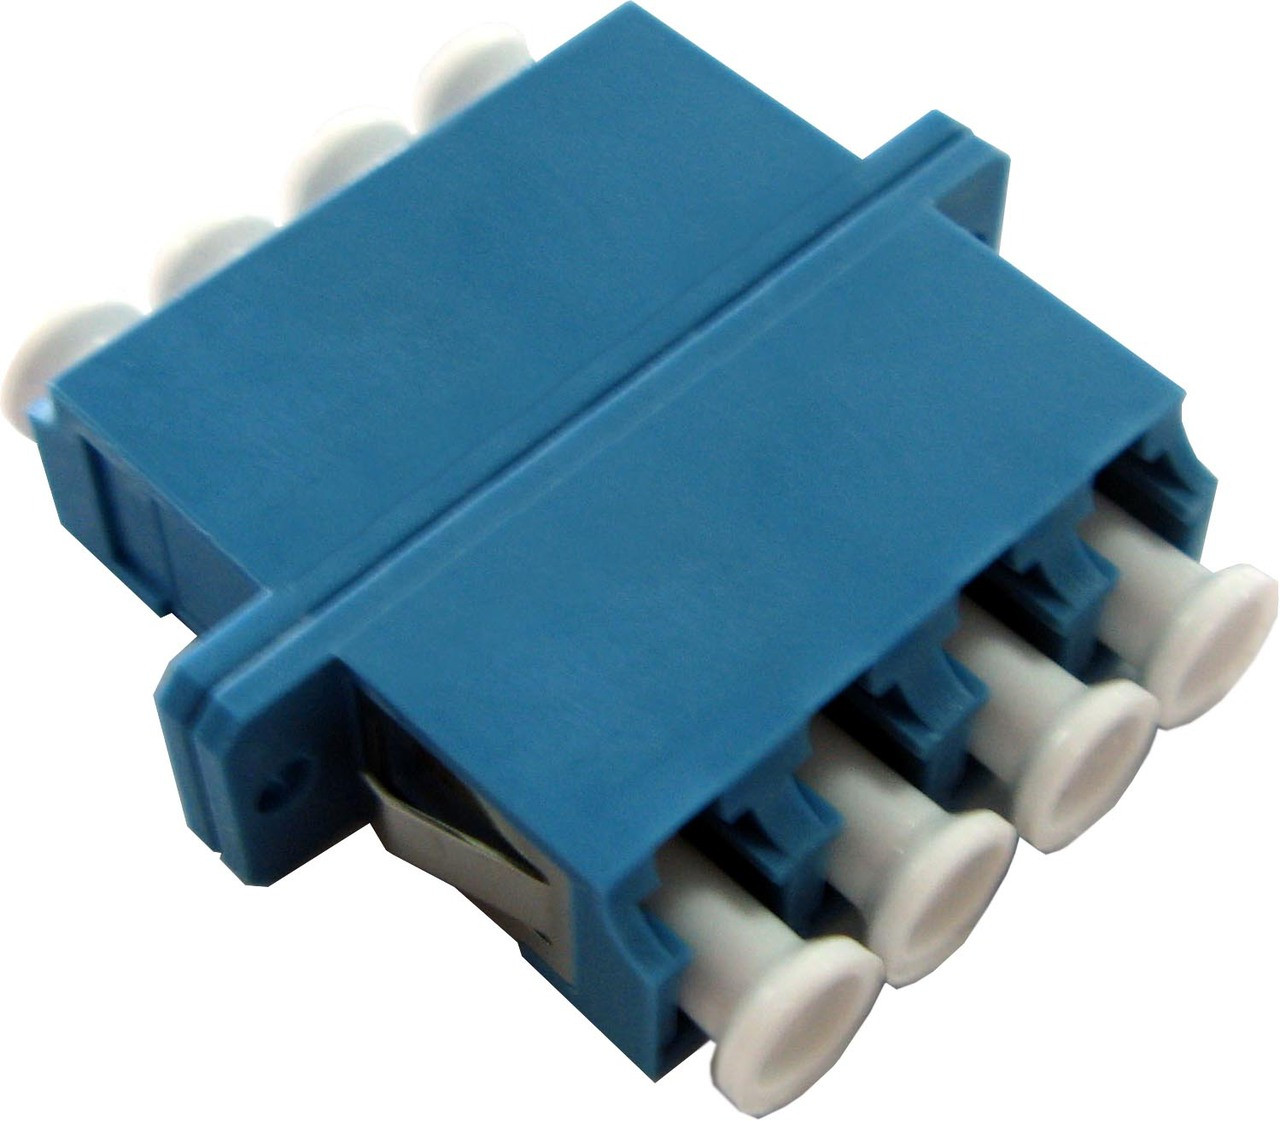 Fibre LC/ LC Quad Single mode Joiner